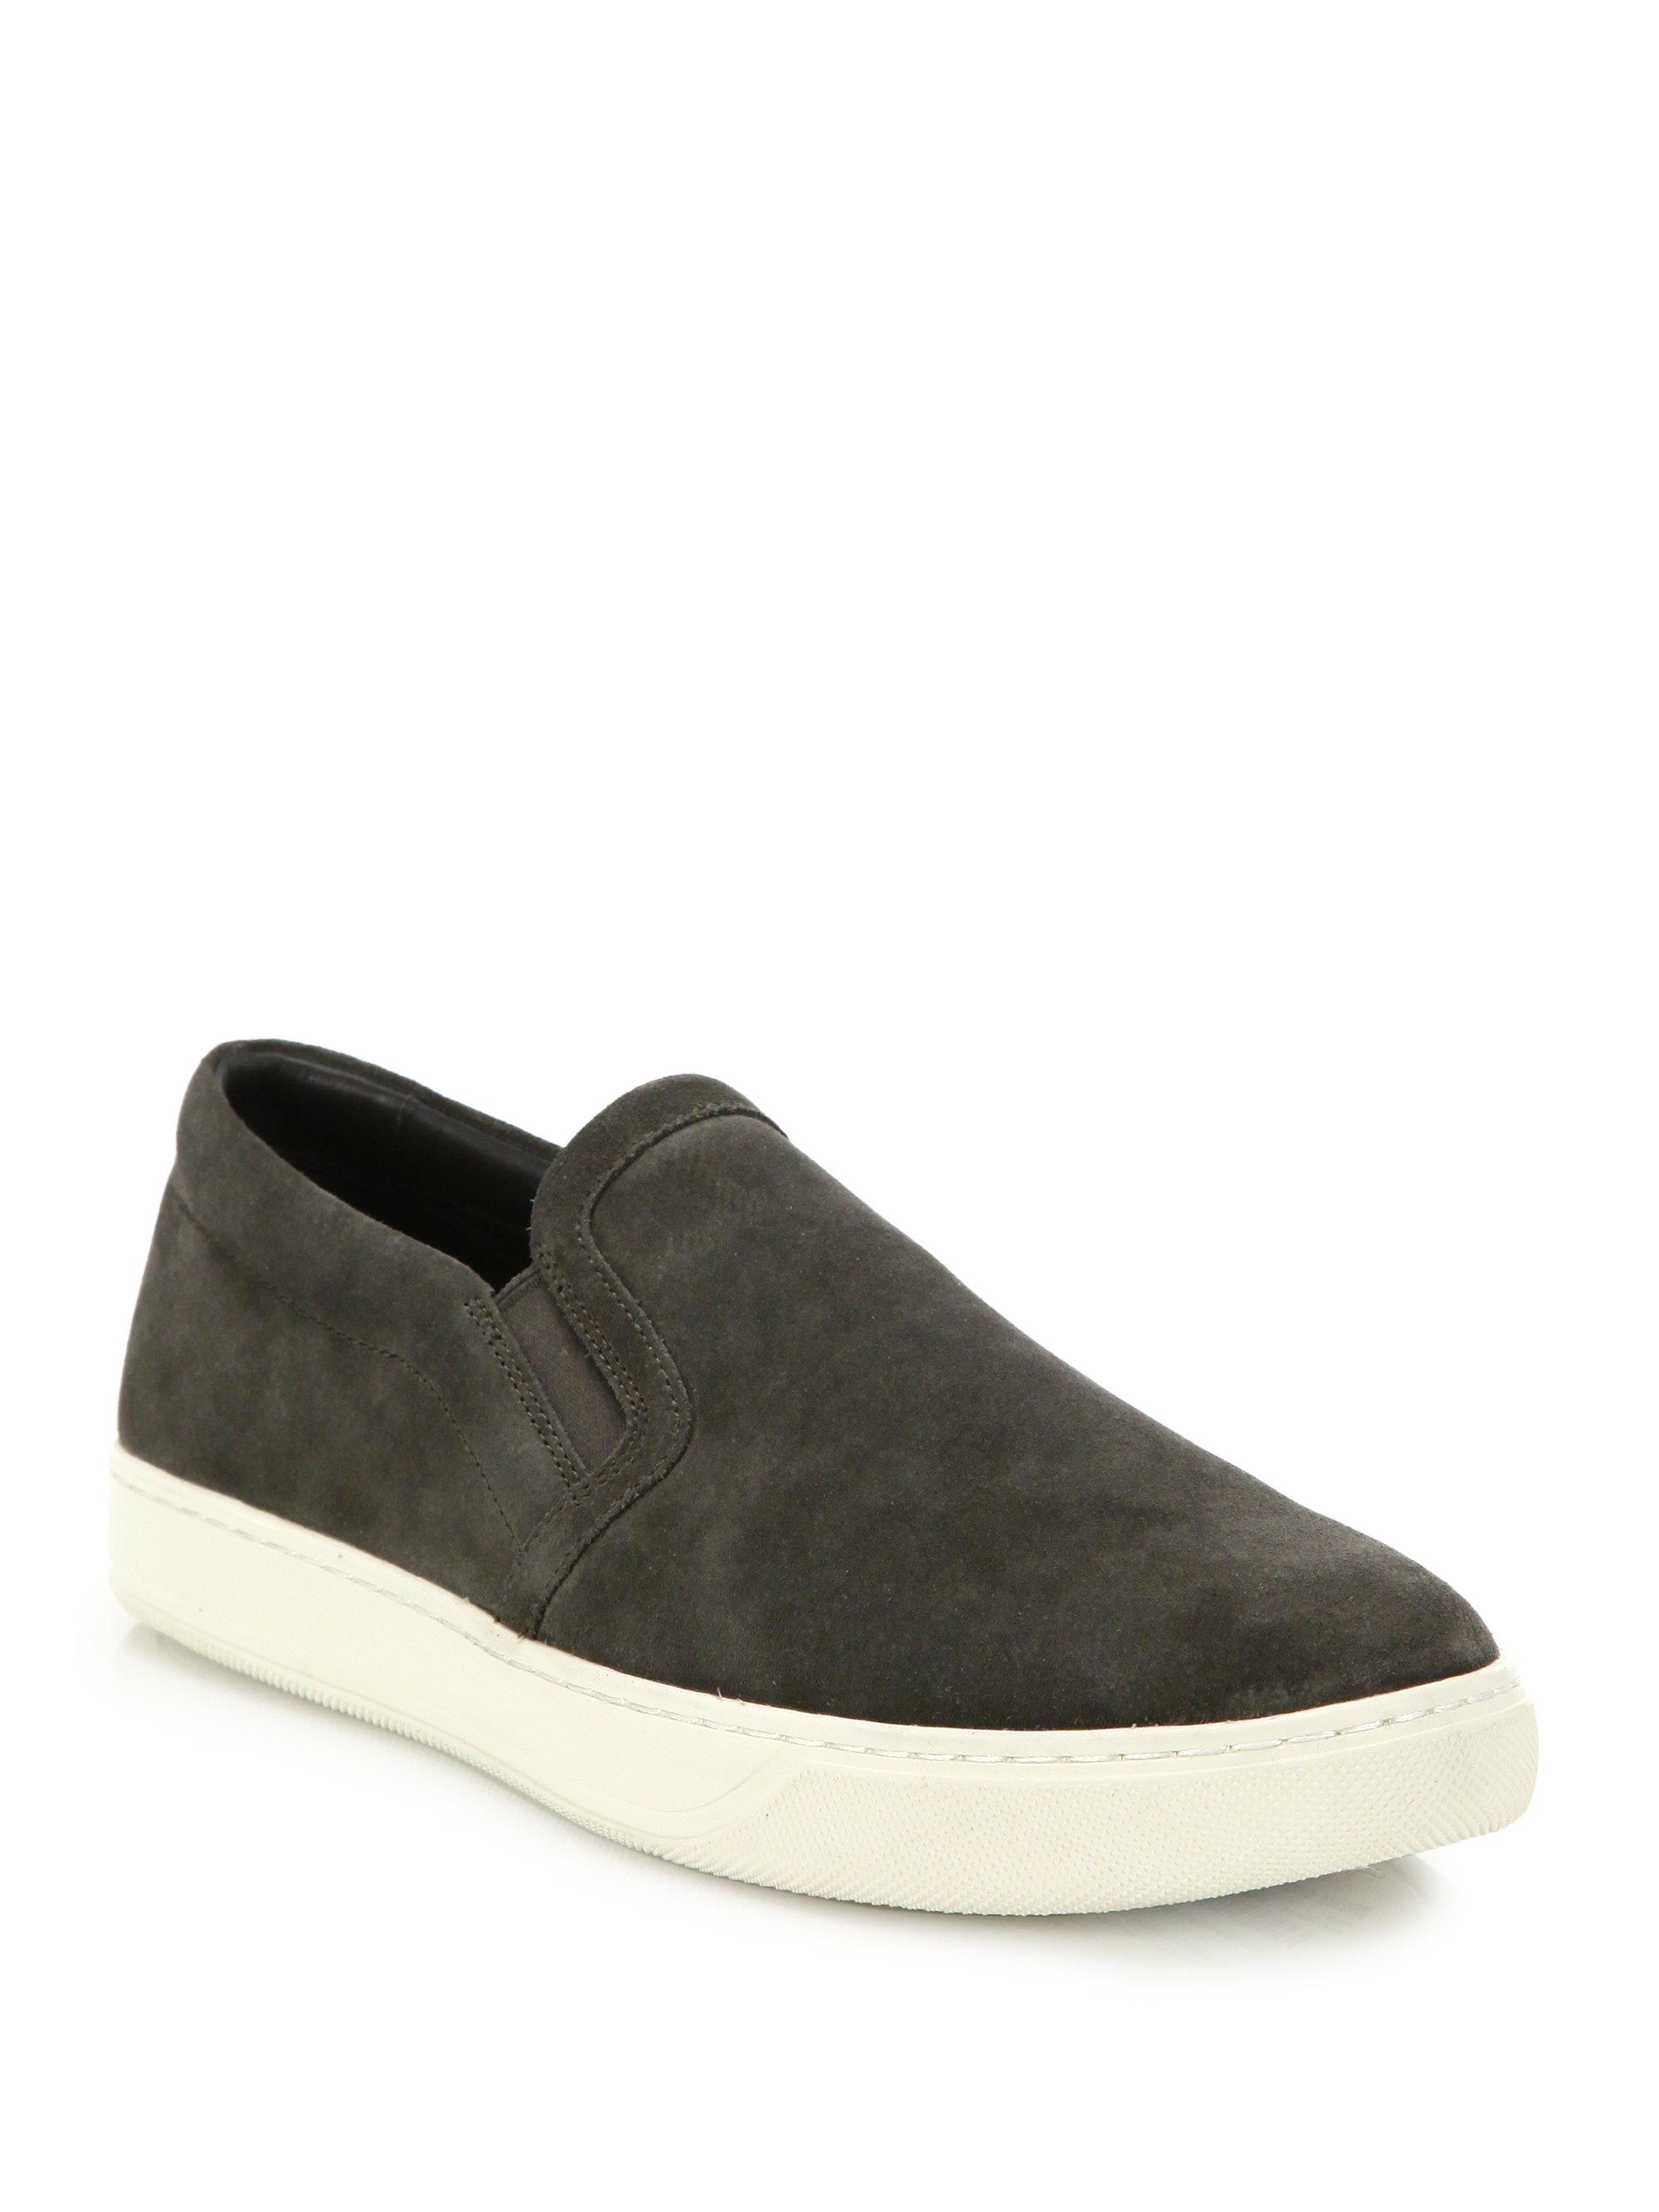 Vince Ranger Coastel Slip-on Sneakers JVK346a5